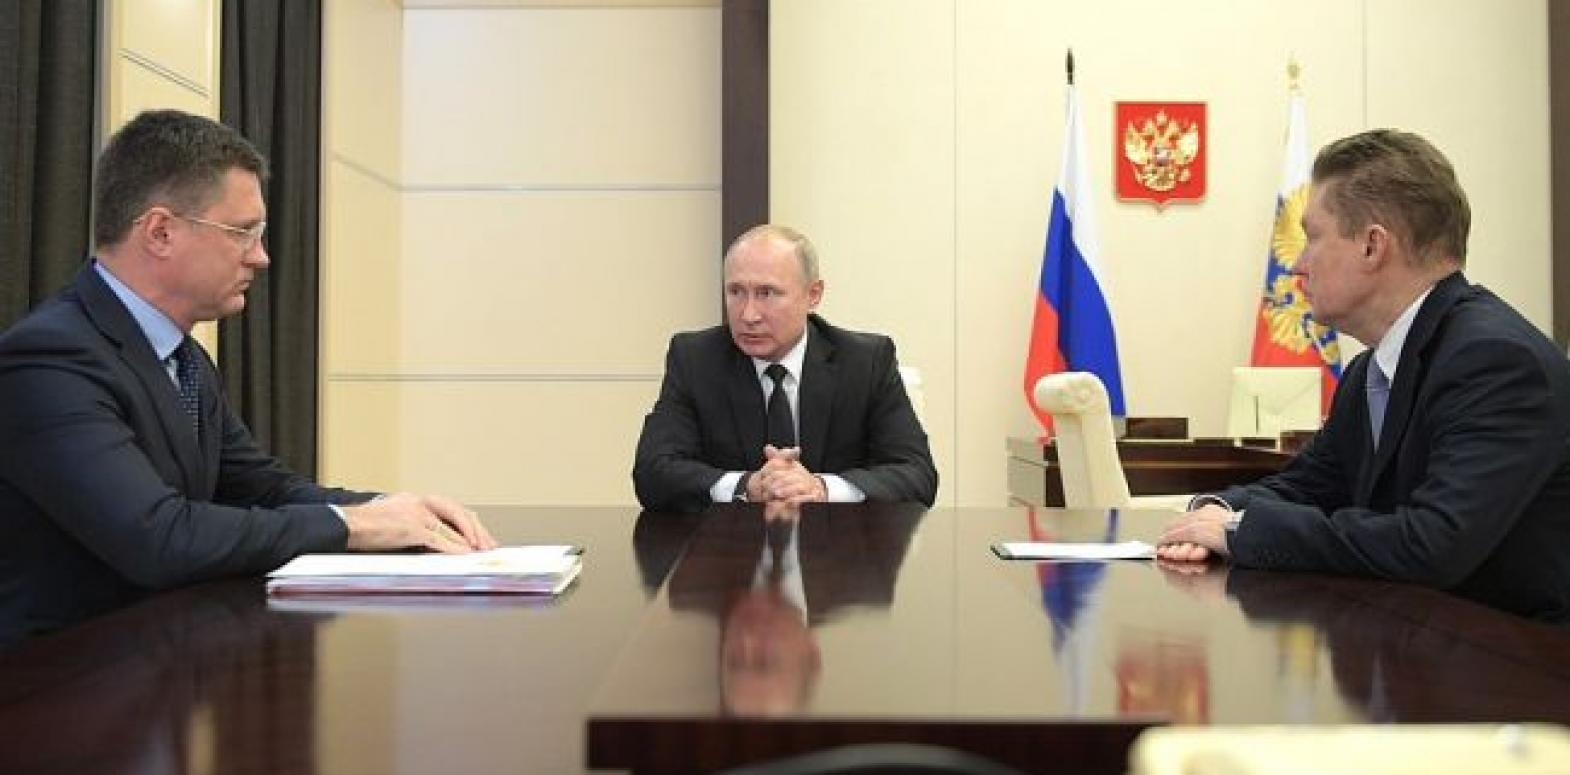 Путин говорил с Зеленским в основном о газе